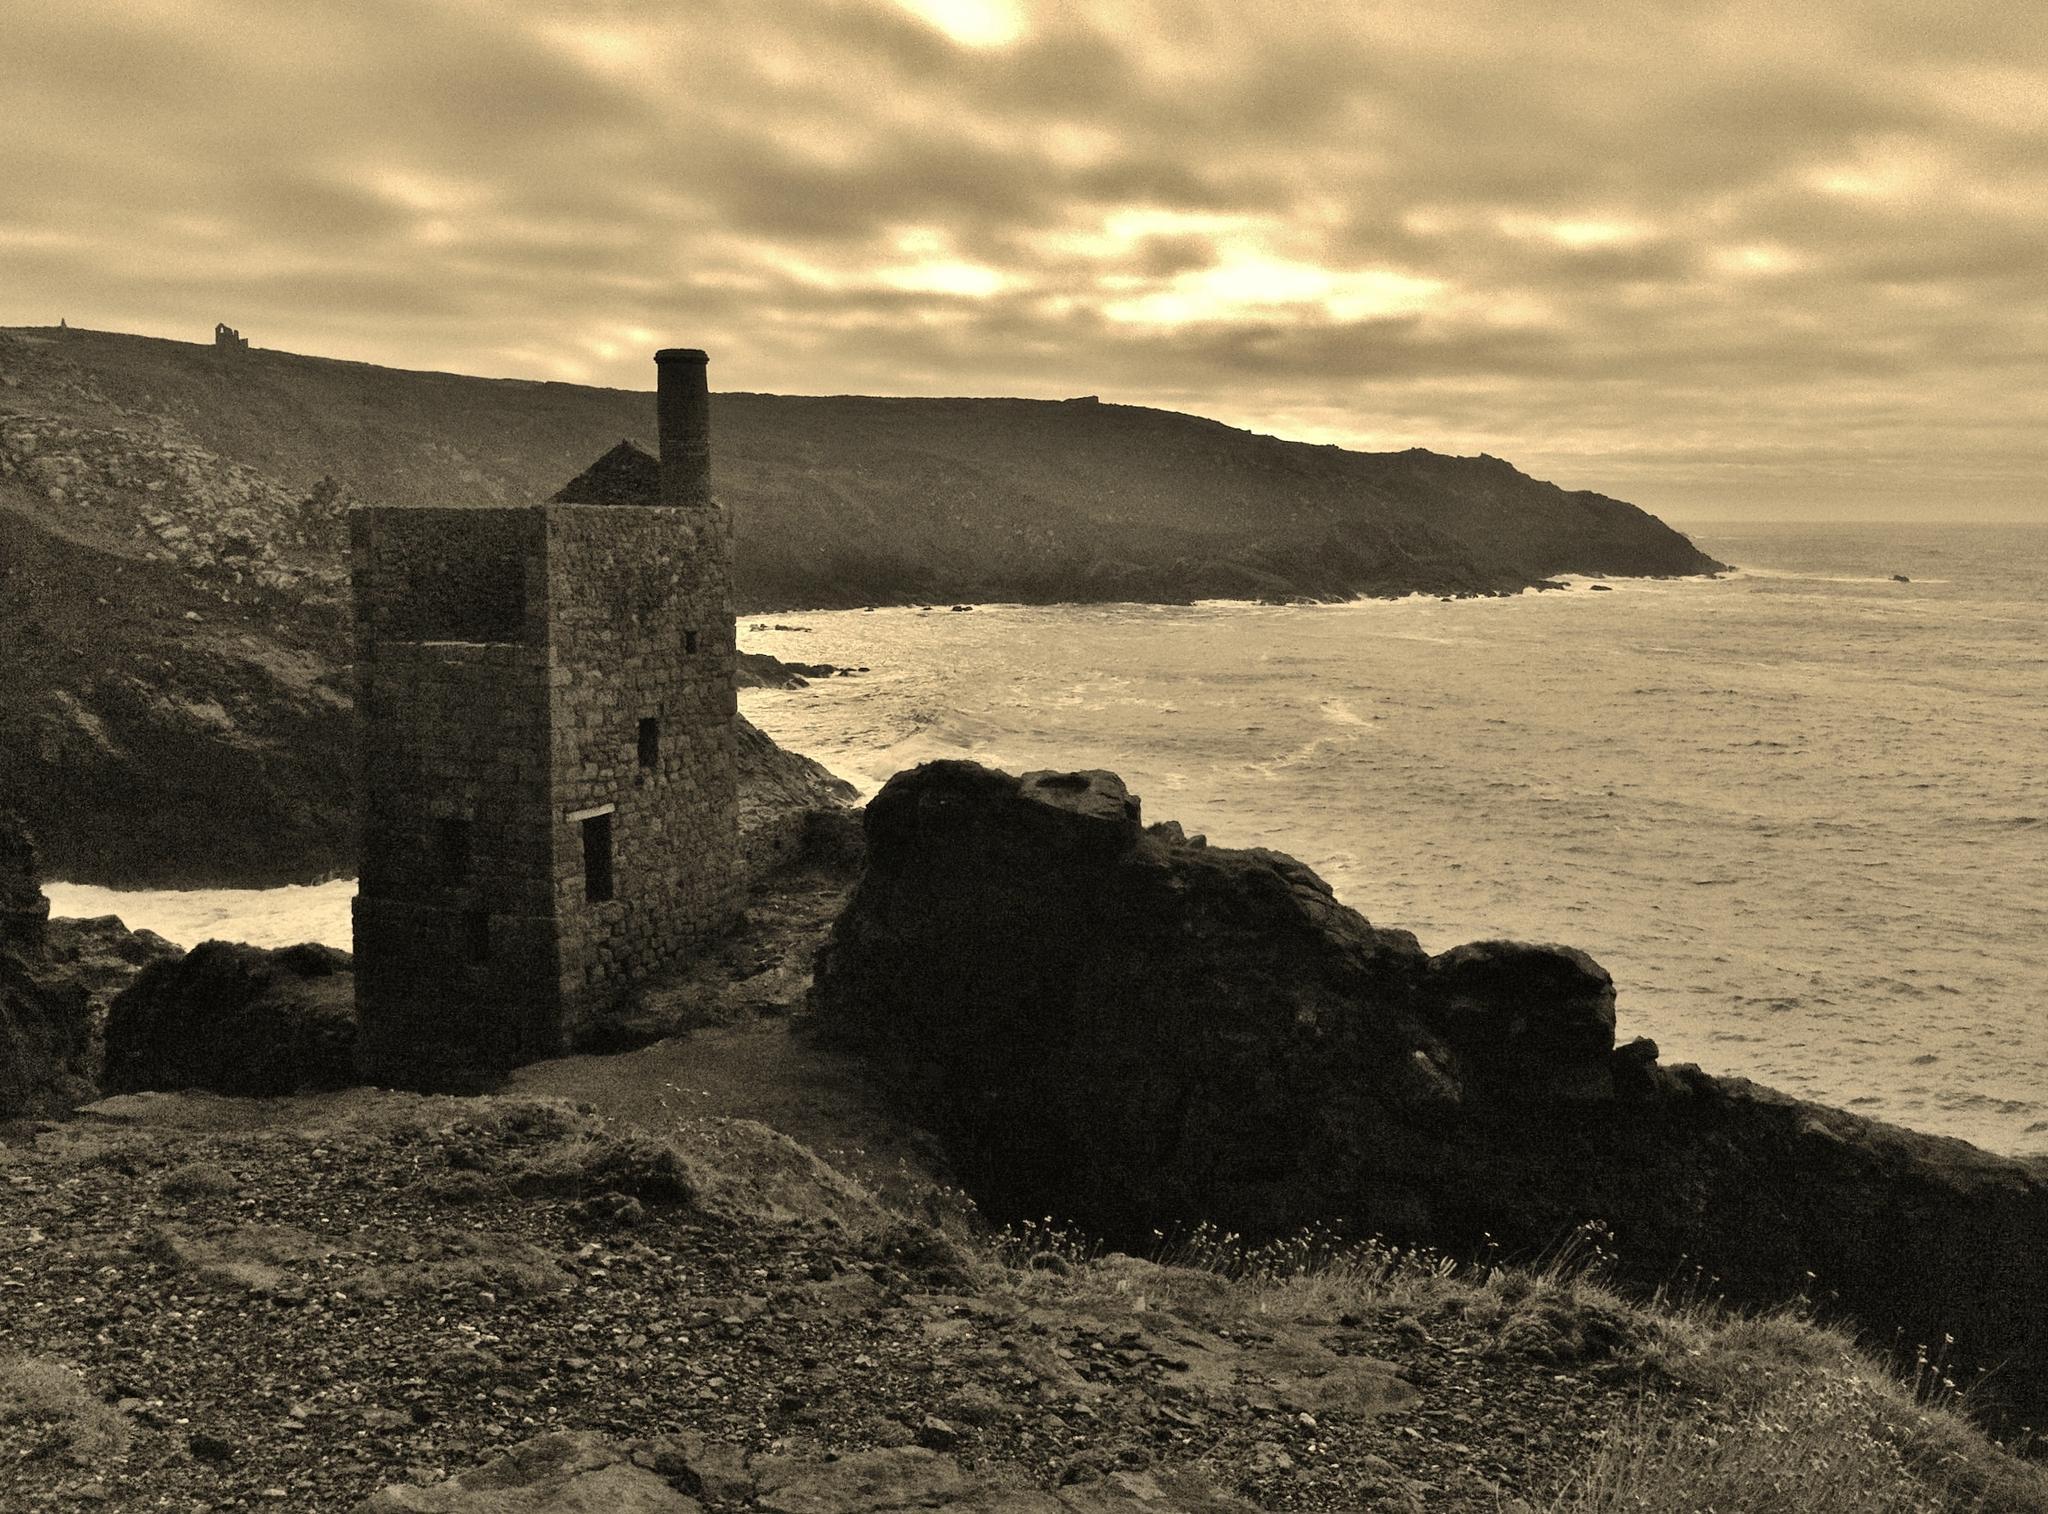 'The Crowns', Bottallack, Cornwall by Nigel Rainton